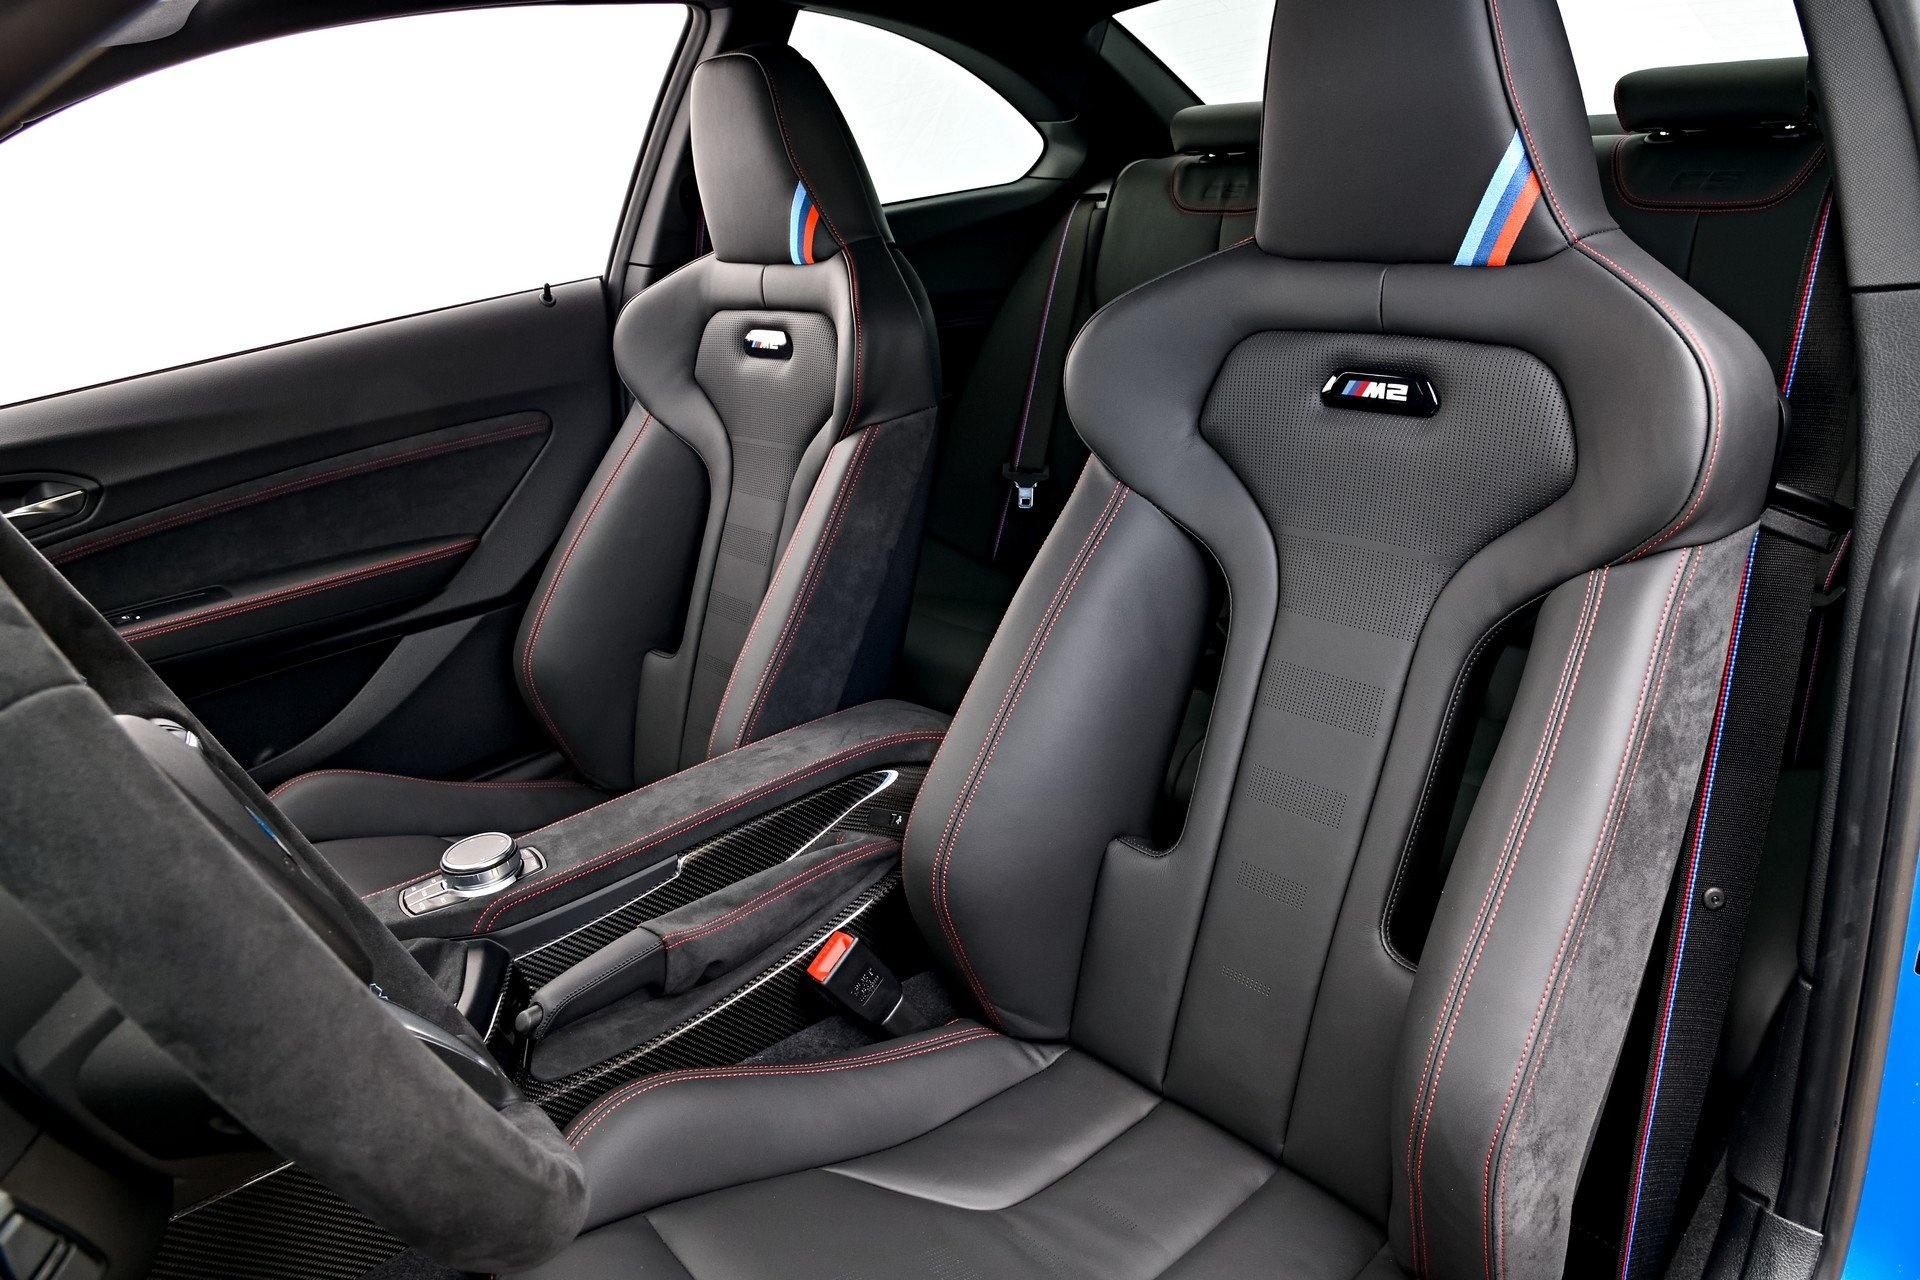 Chiem nguong BMW M2 C2 2020 anh 22